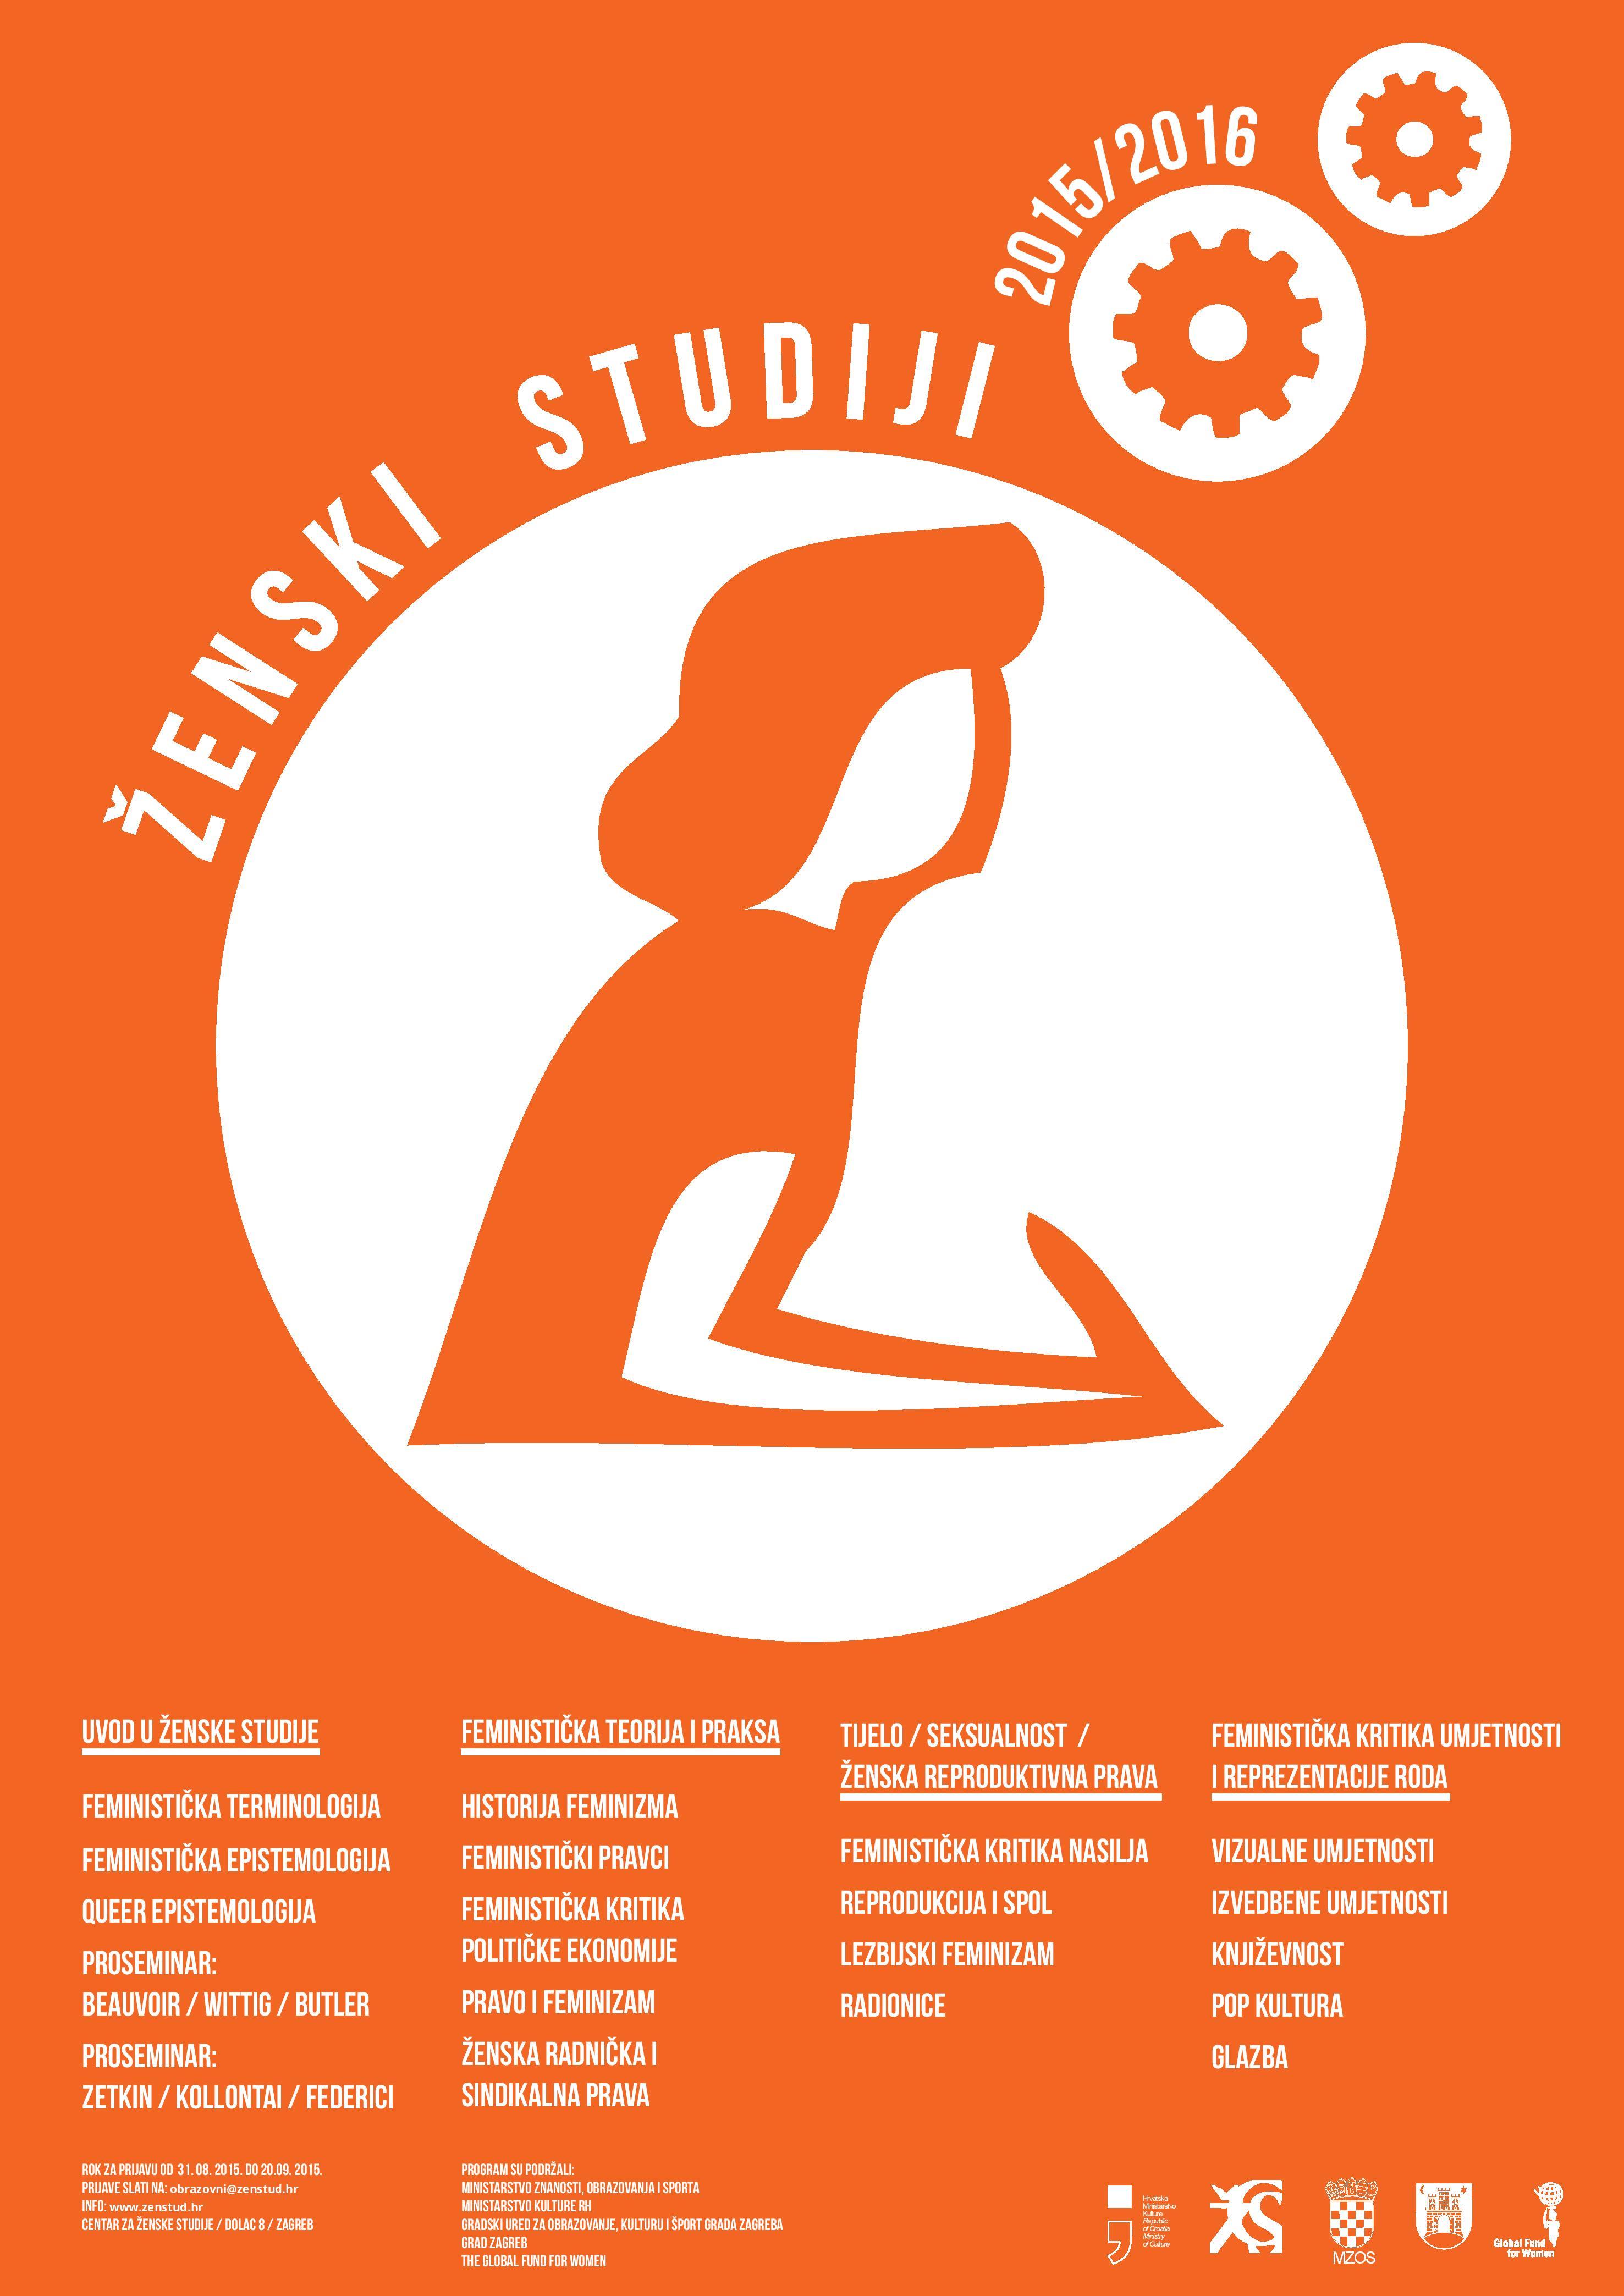 plakat_ženski studiji_2015_16-page-001